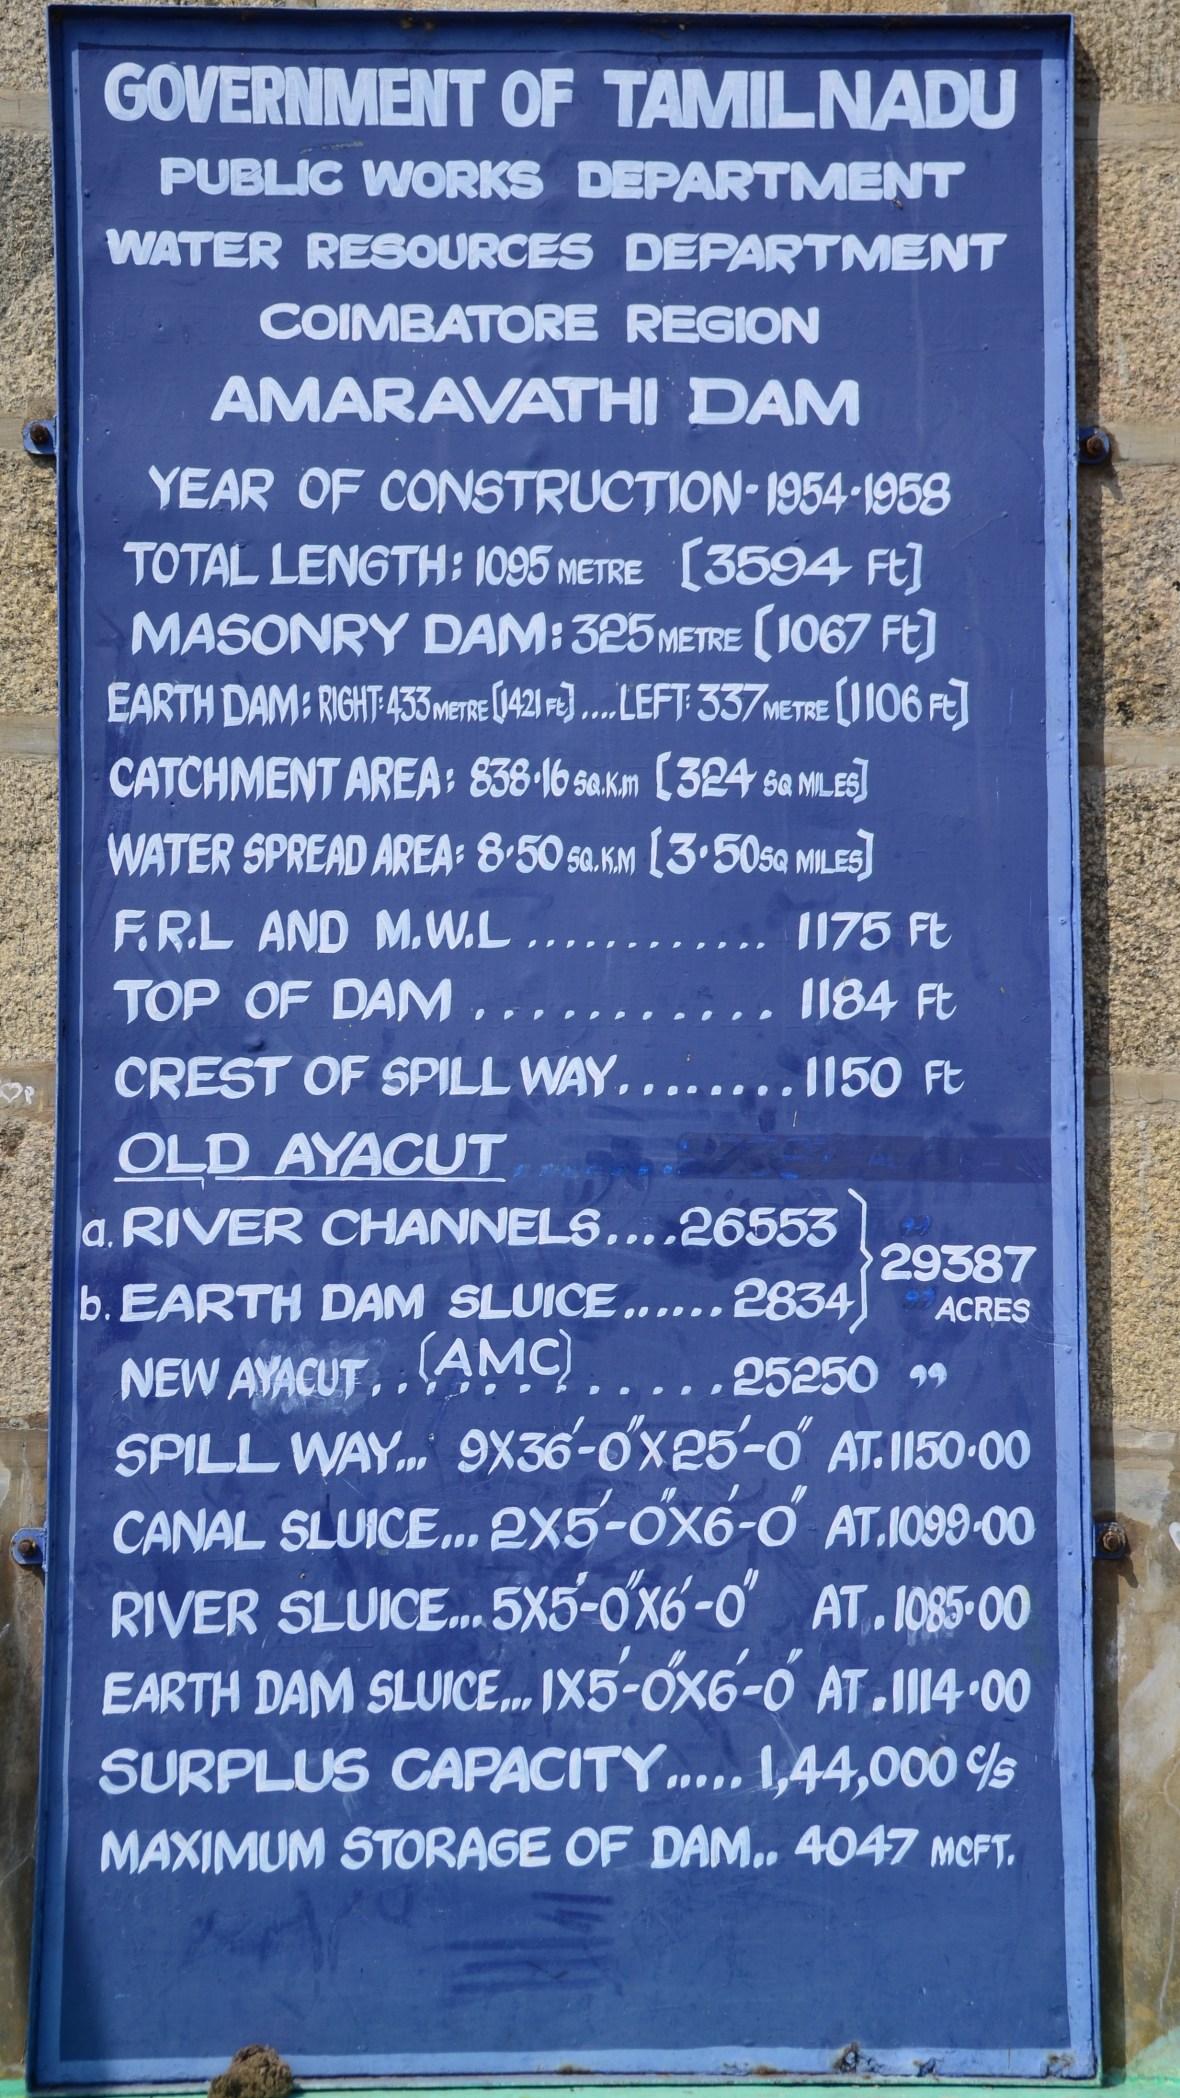 Amravathi Dam Statistics